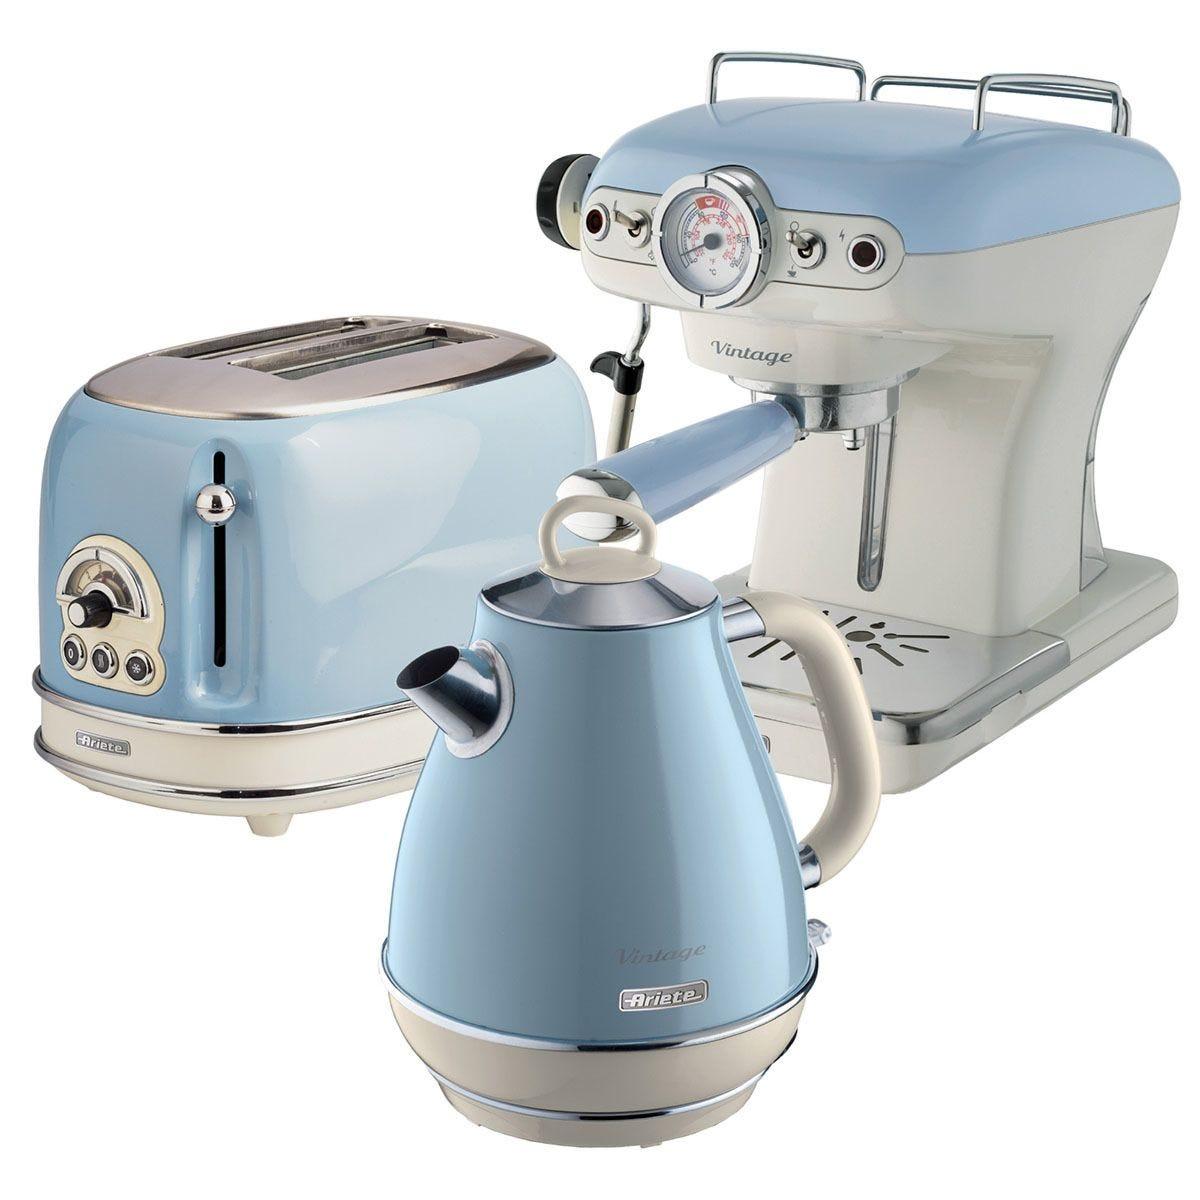 Ariete Vintage 2-Slice Toaster, 1.7L Jug Kettle, and Espresso Coffee Maker - Blue